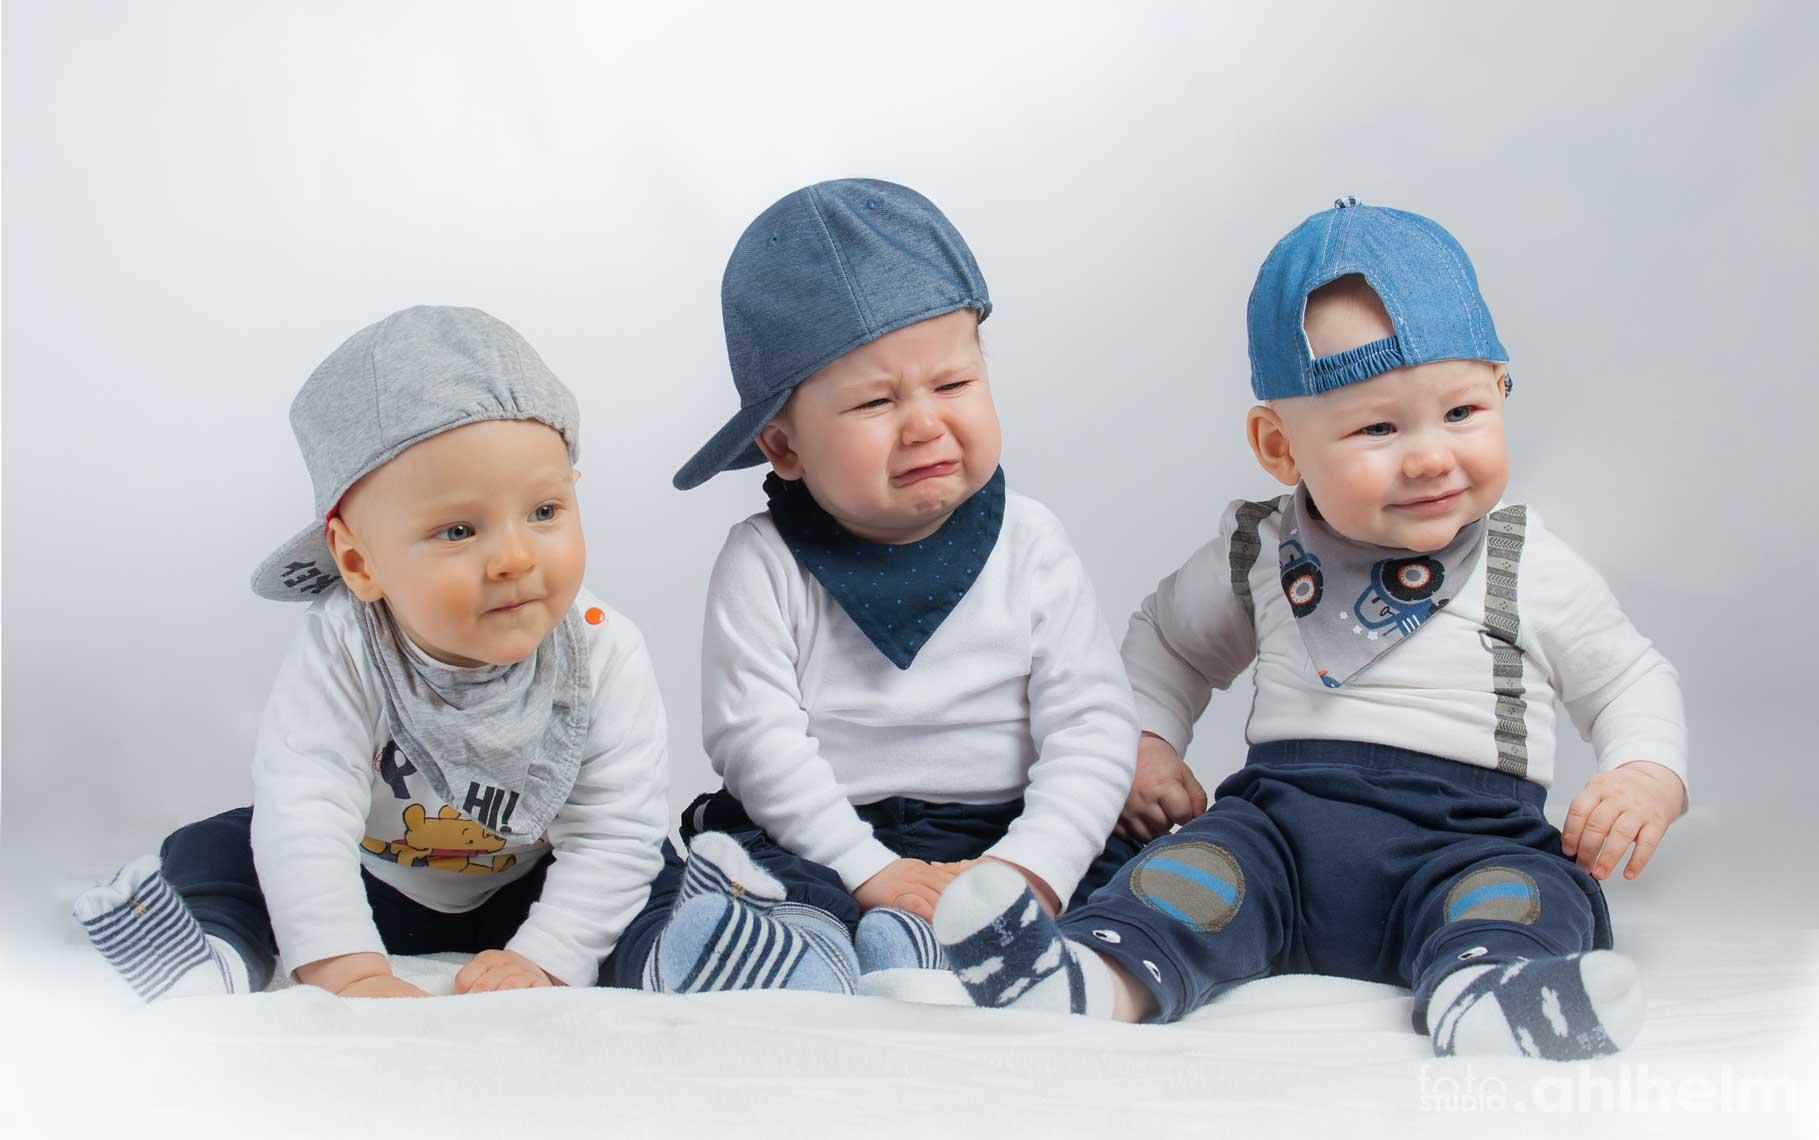 Fotostudio Ahlhelm Kinder kleine Kumpels